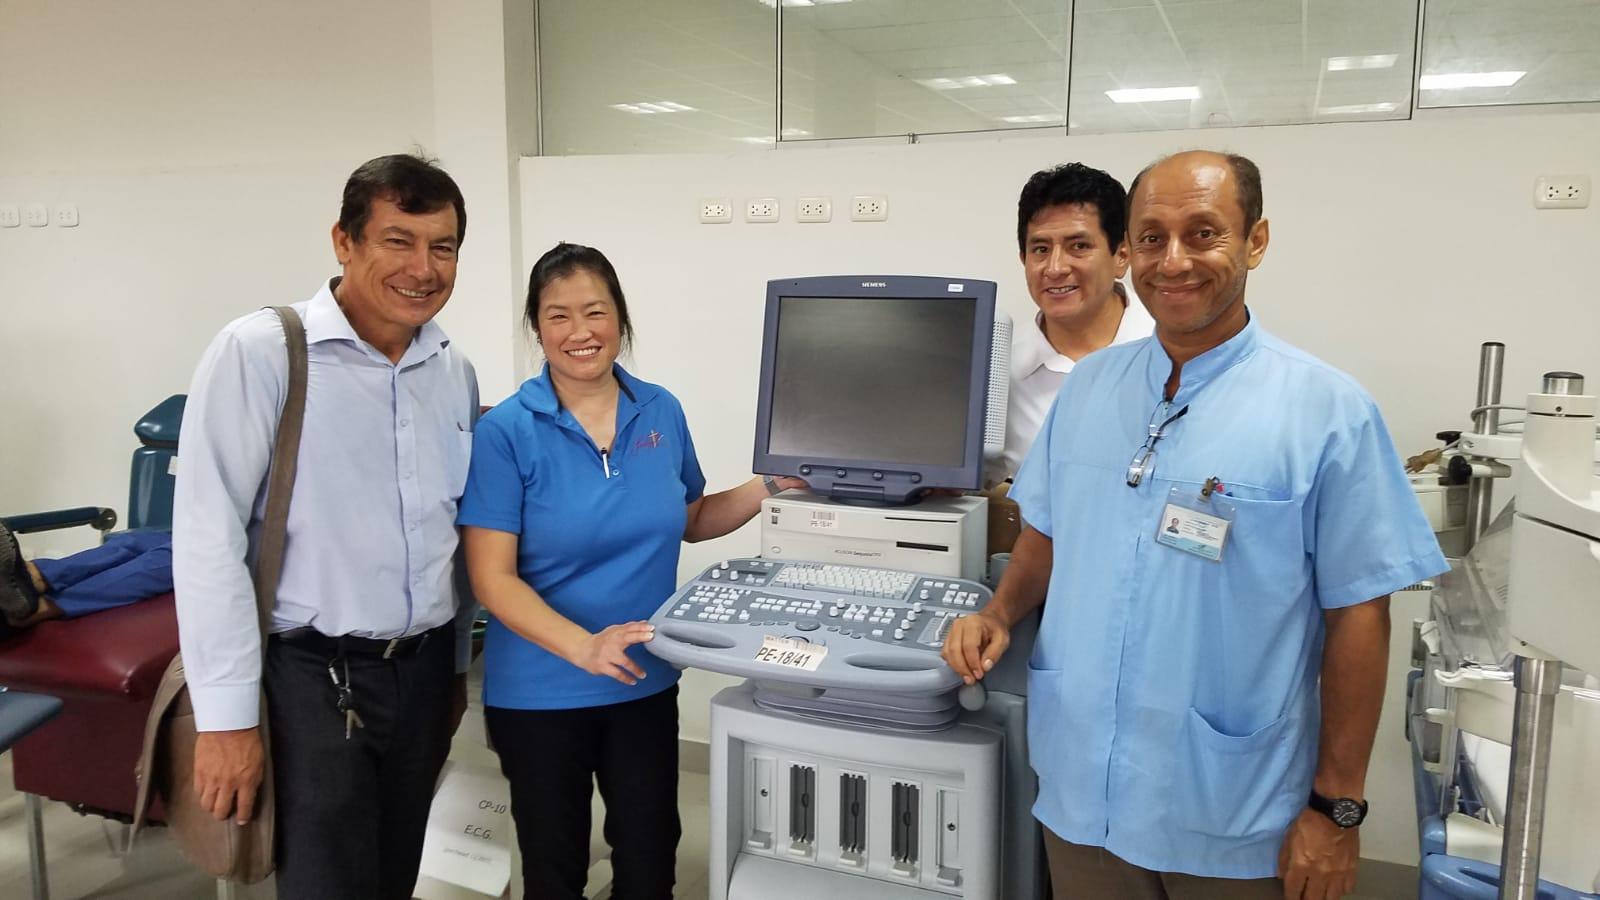 MATTER redistributes medical equipment & supplies